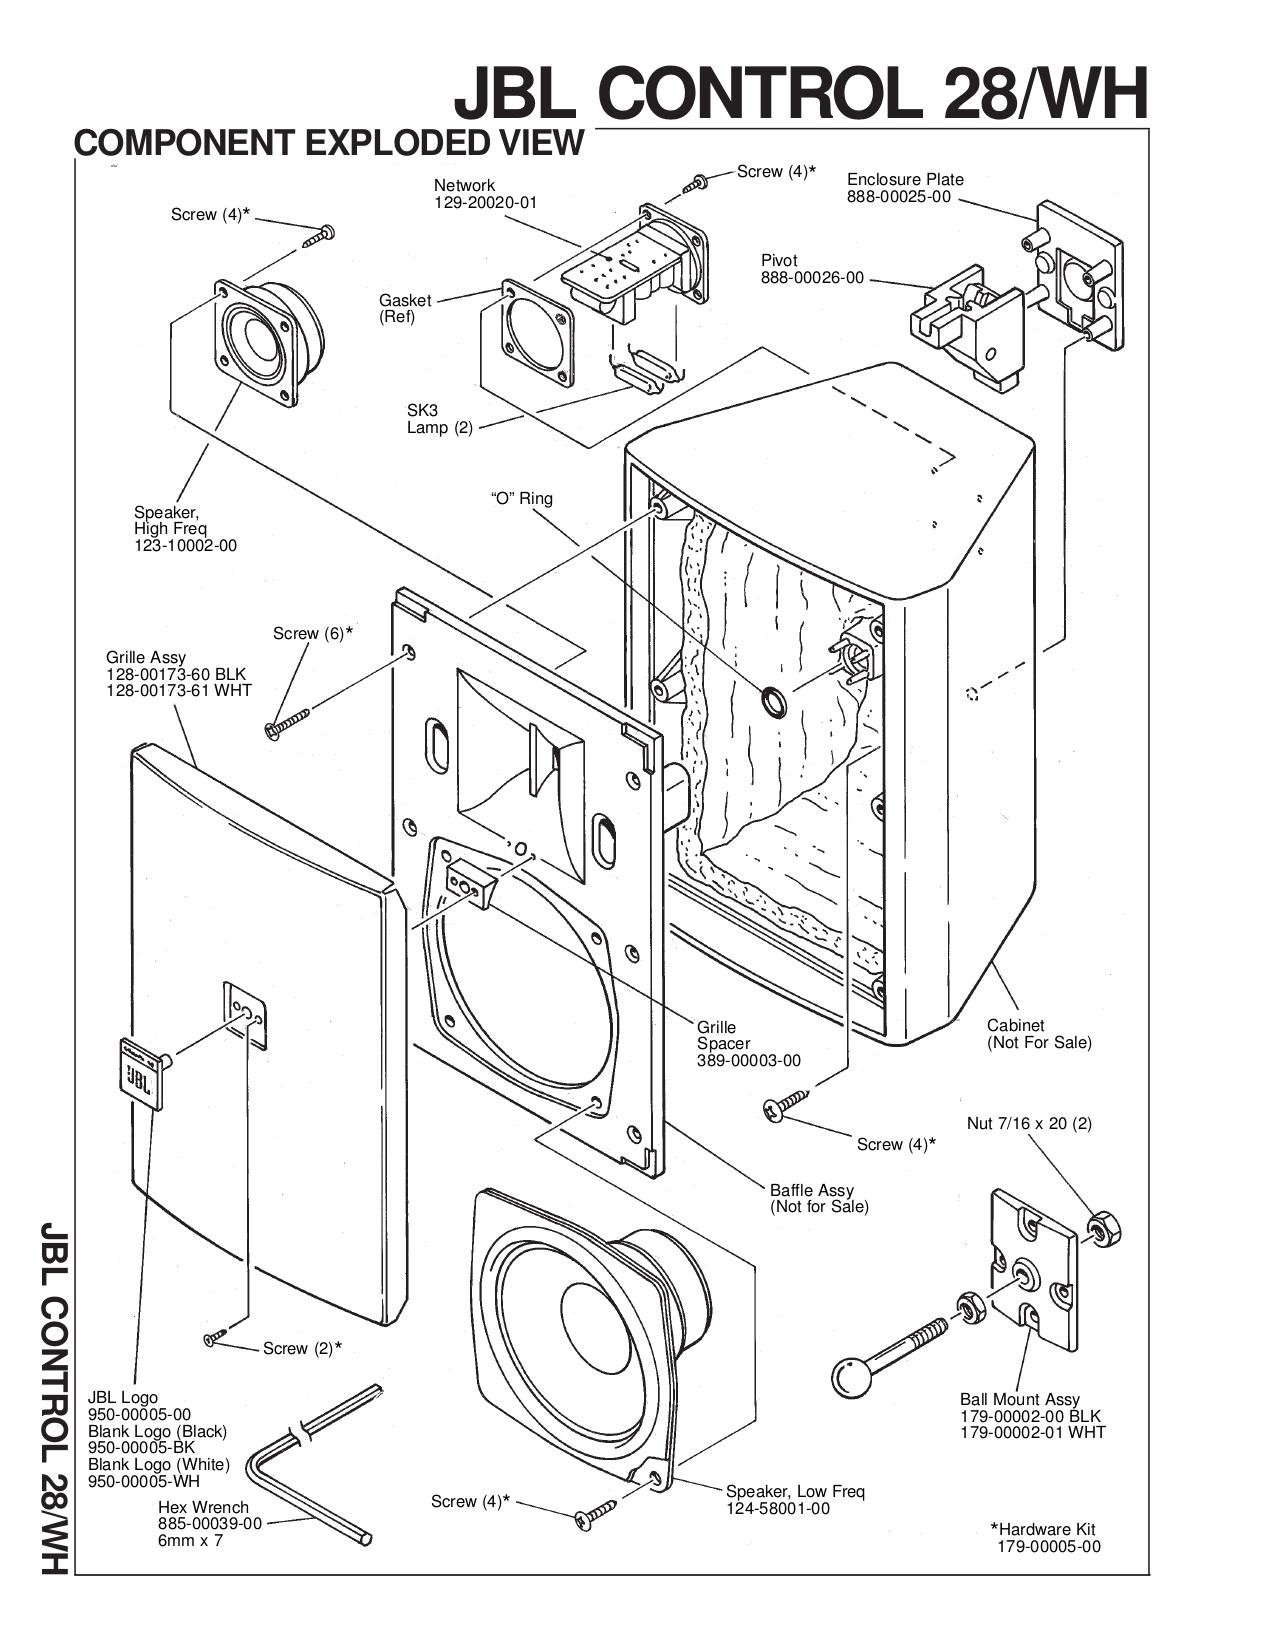 Jbl Control 25 Wiring Diagram Data Exterior Enclosures Pdf Manual For Speaker Altec